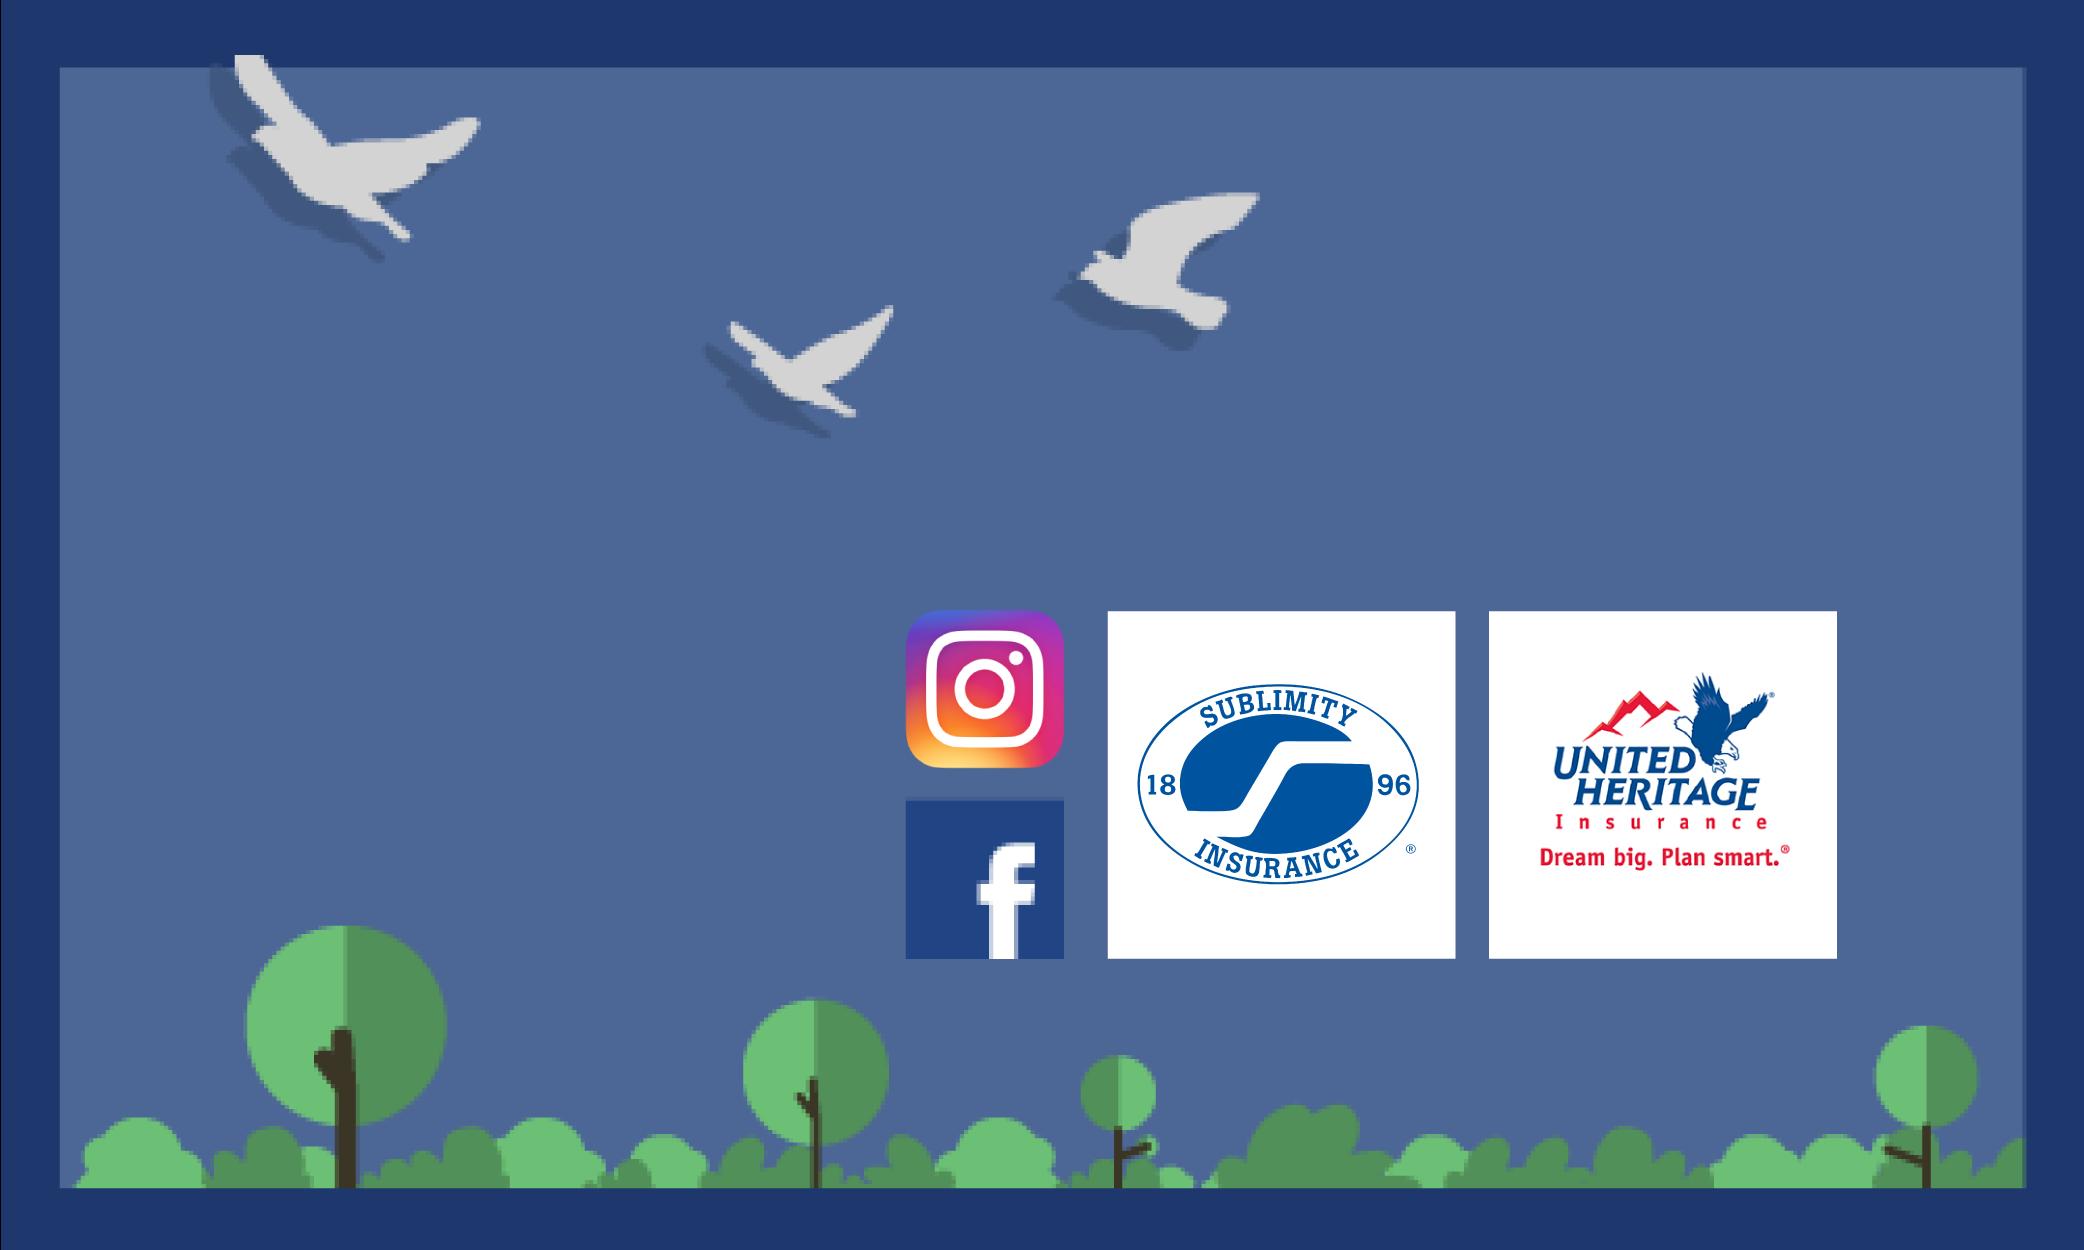 United Heritage Insurance — Social Media